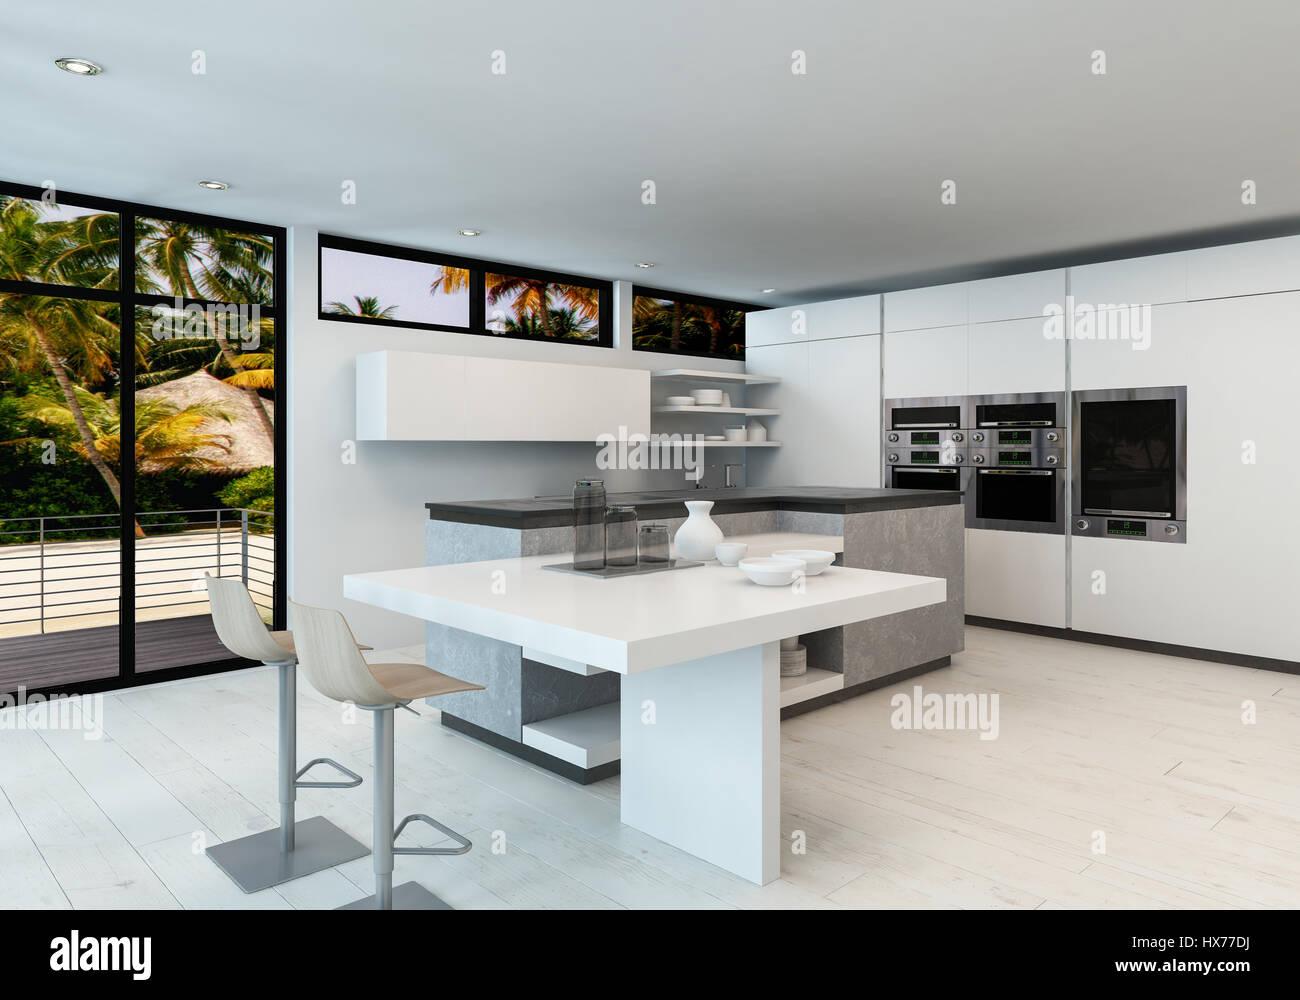 Blanc propre moderne cuisine ouverte avec comptoir bar Bar cuisine ouverte